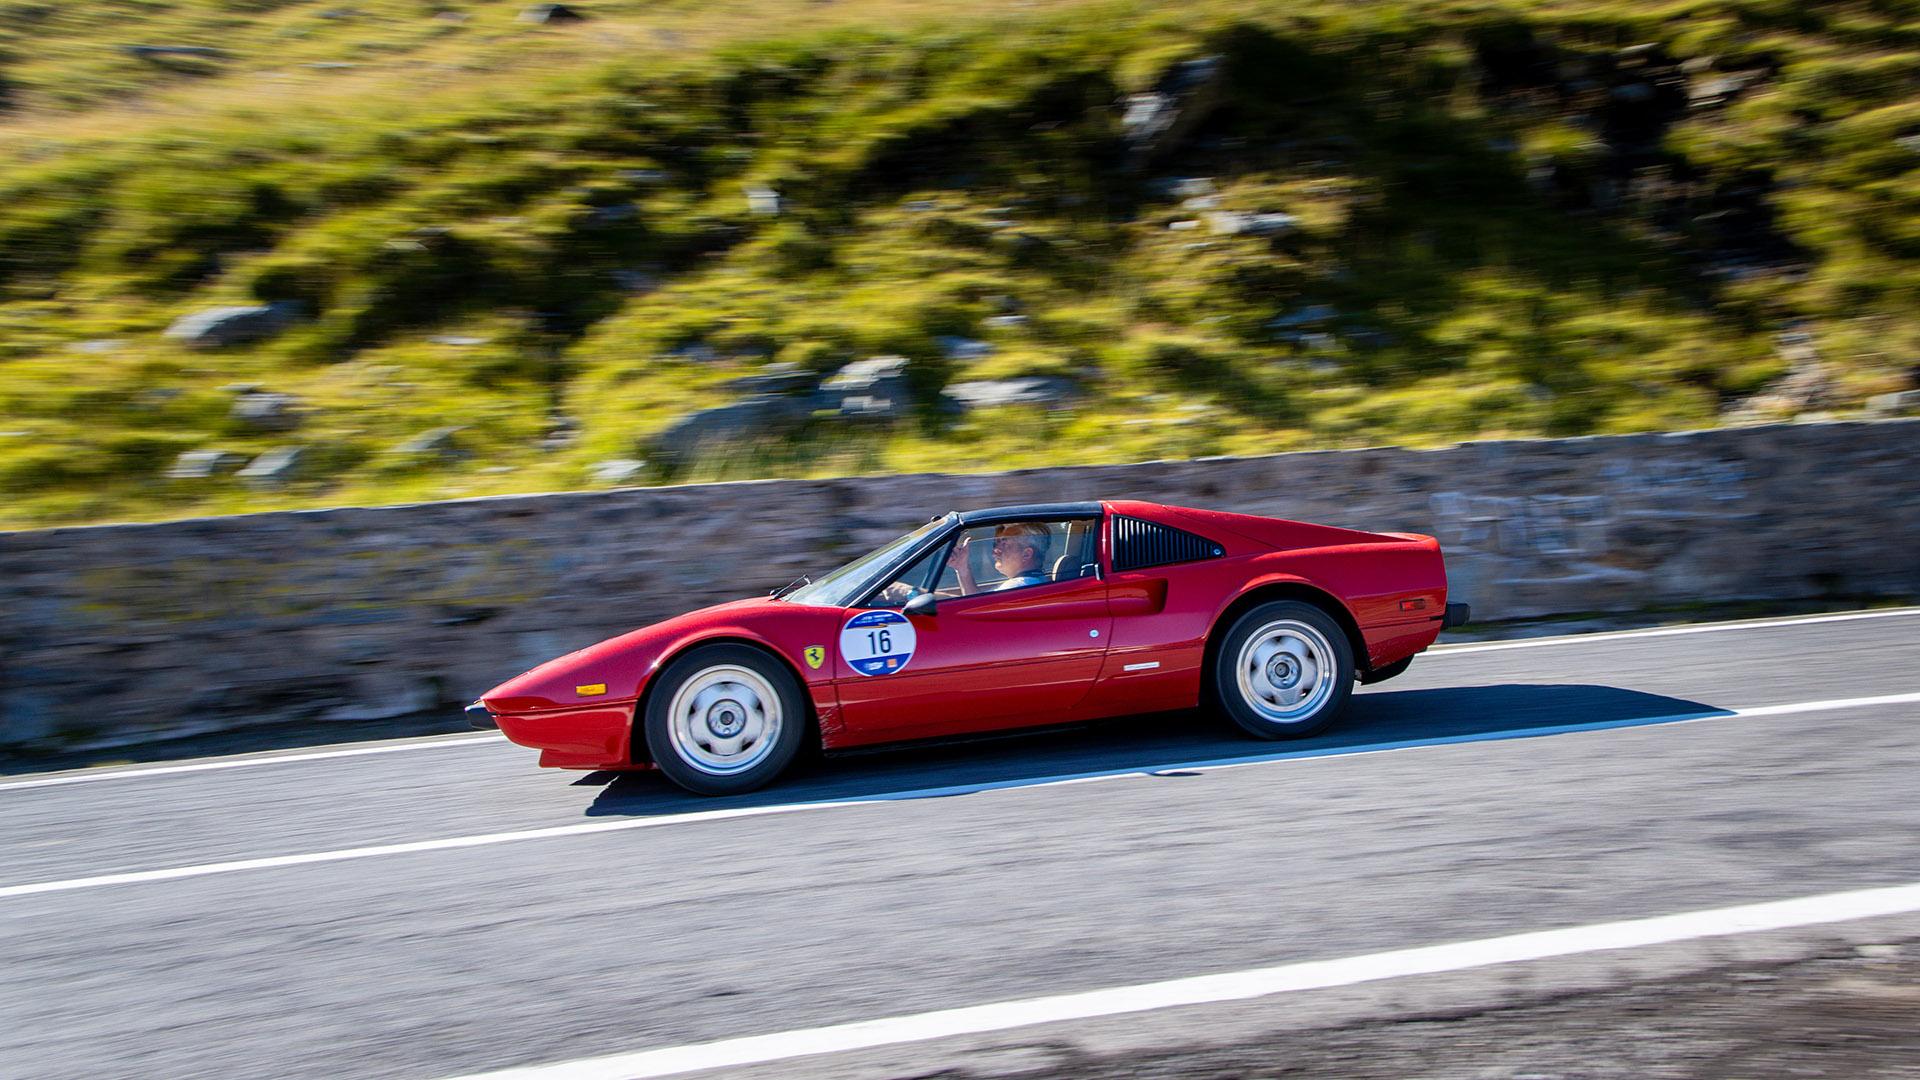 Transylvania_Classic_Sibiu_2020_Ferrari_308GTS_1979